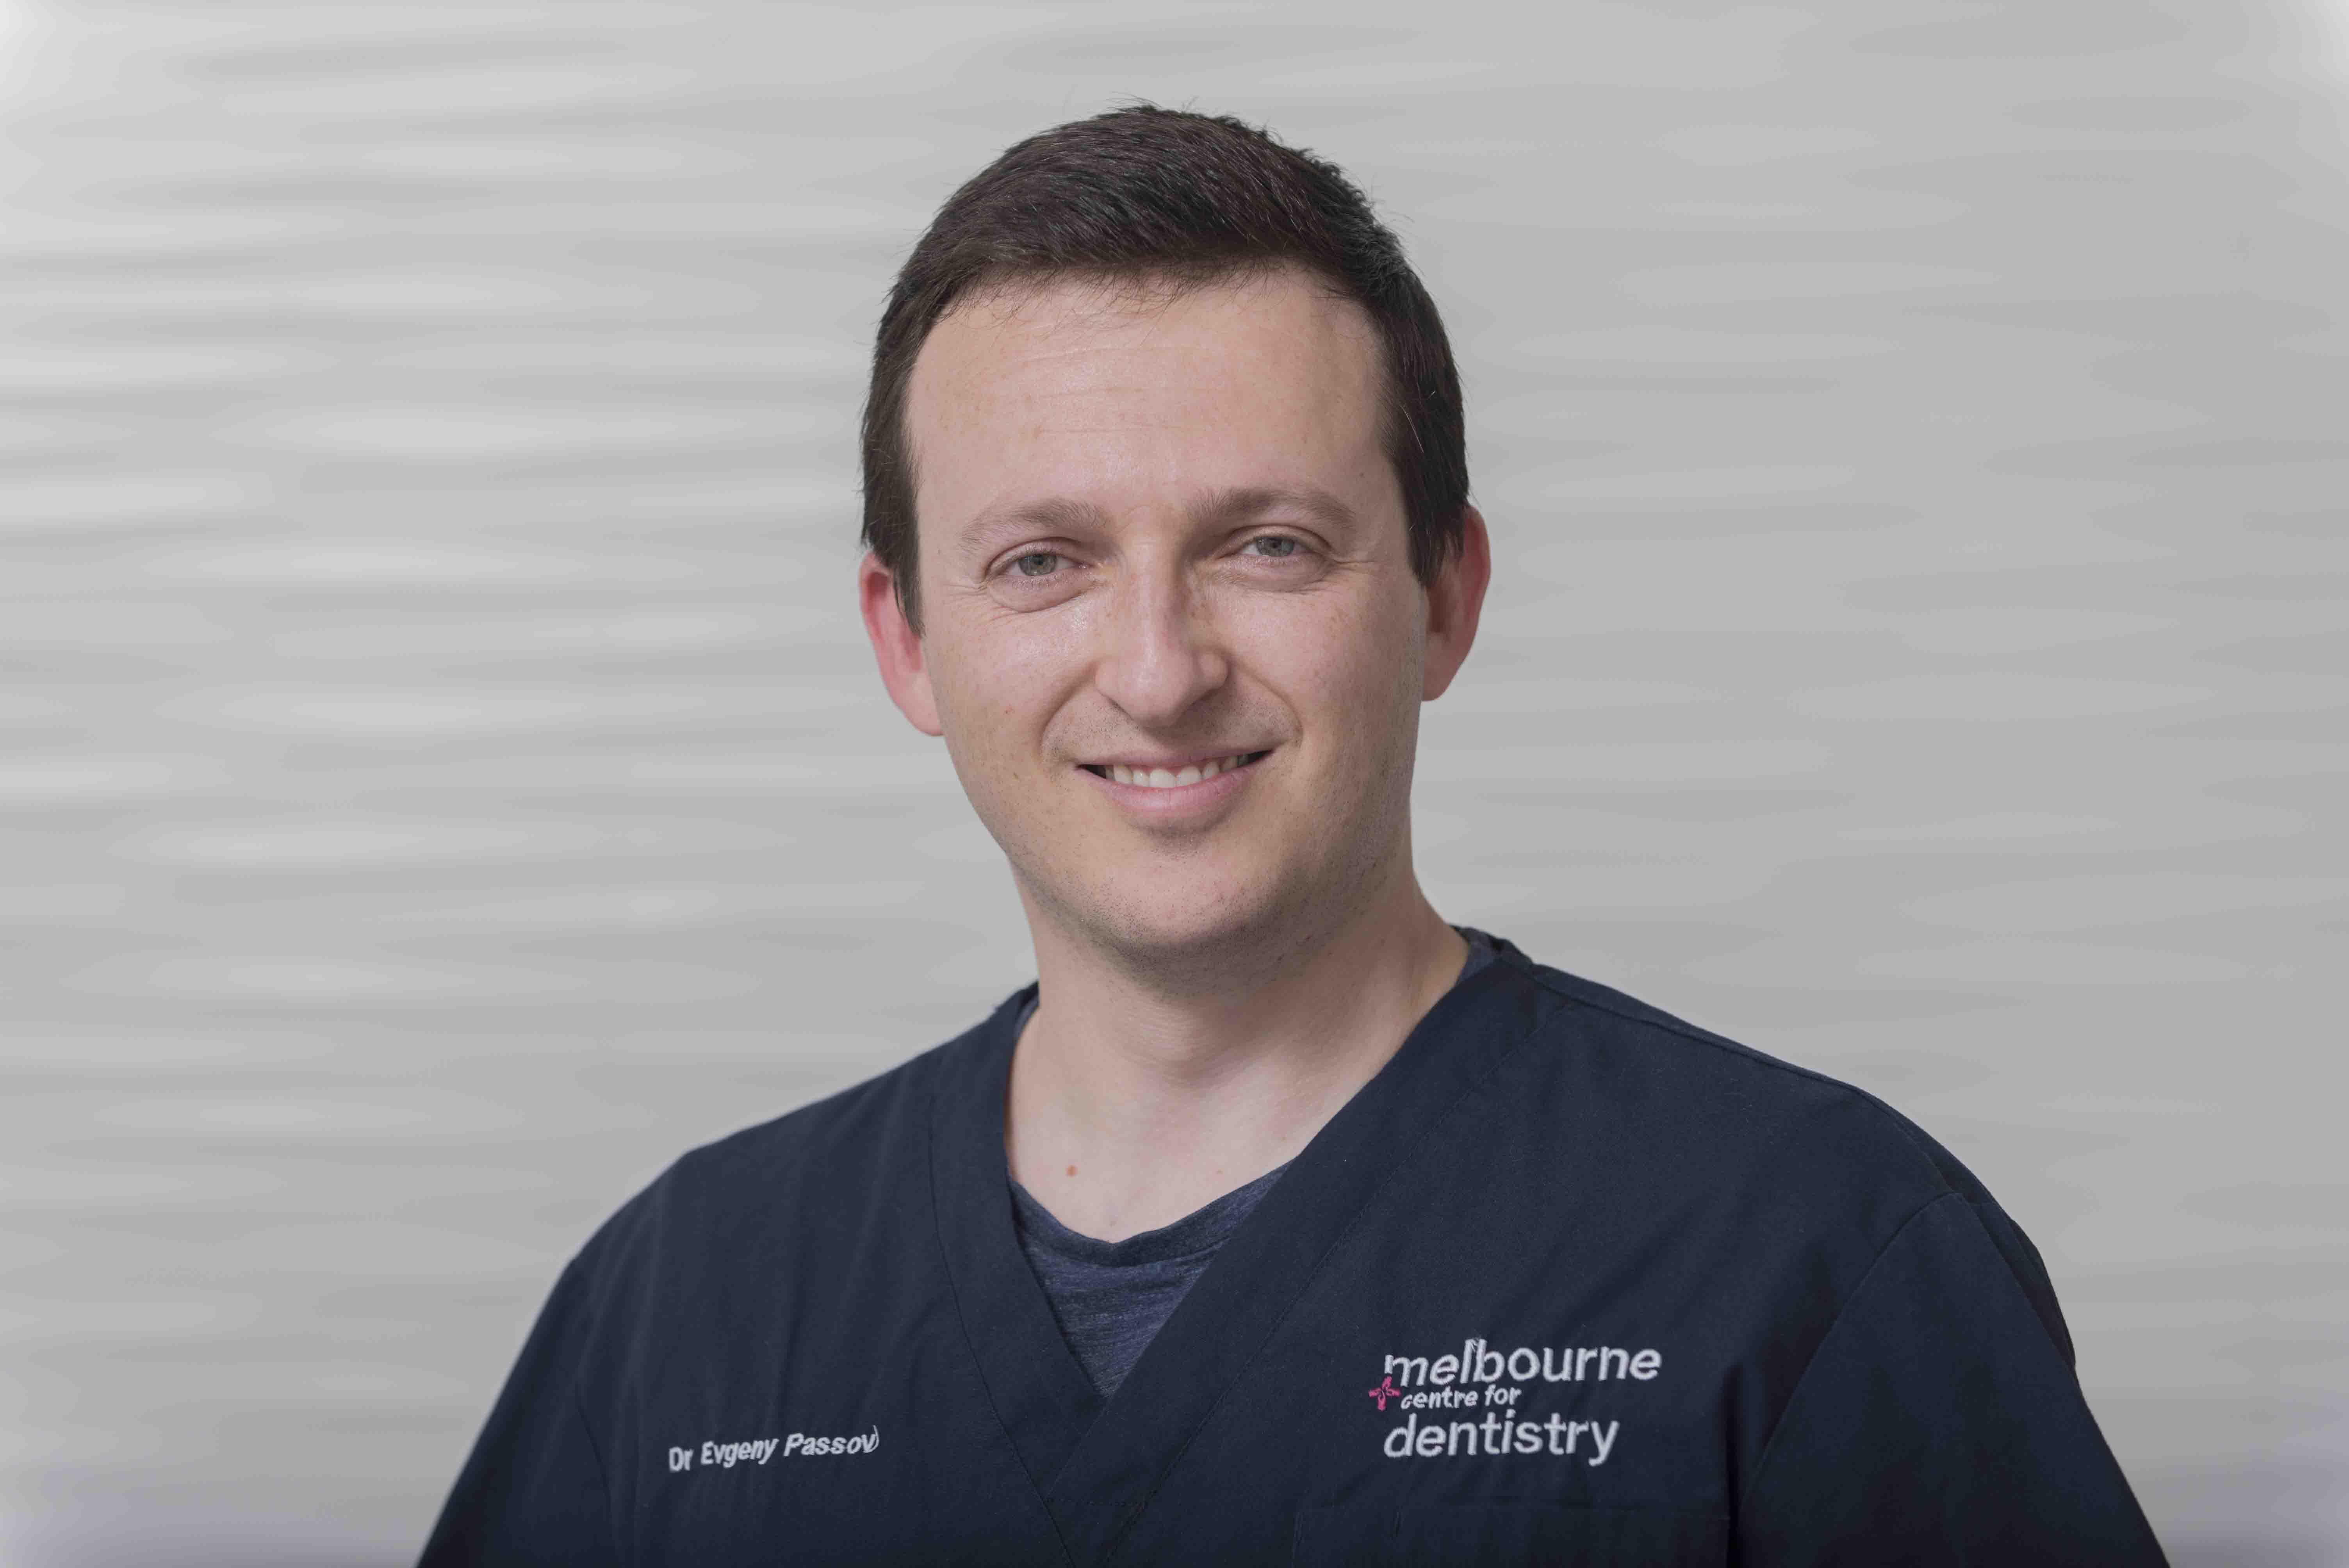 Dr Evgeny